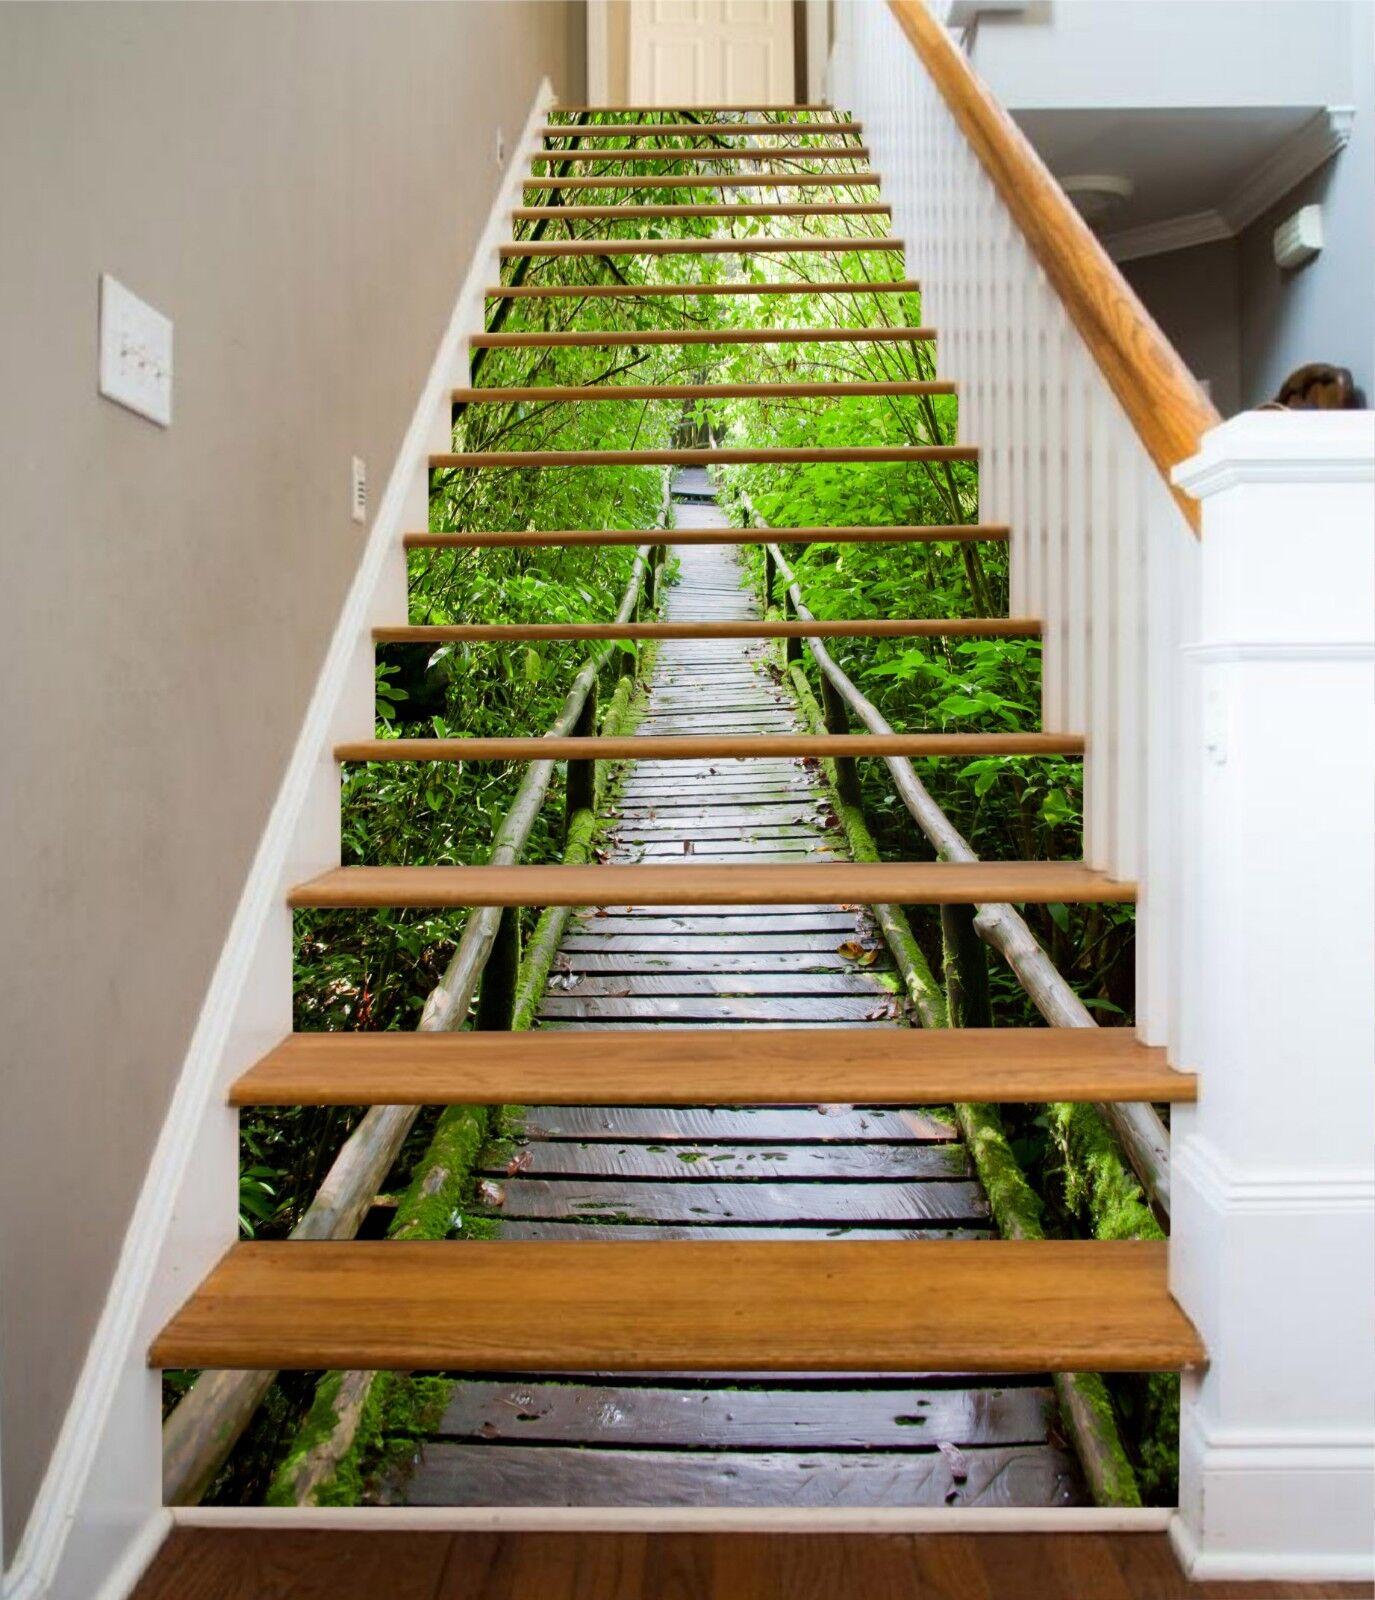 3D Bridge Tree 36 Stair Risers Decoration Photo Mural Vinyl Decal Wallpaper US